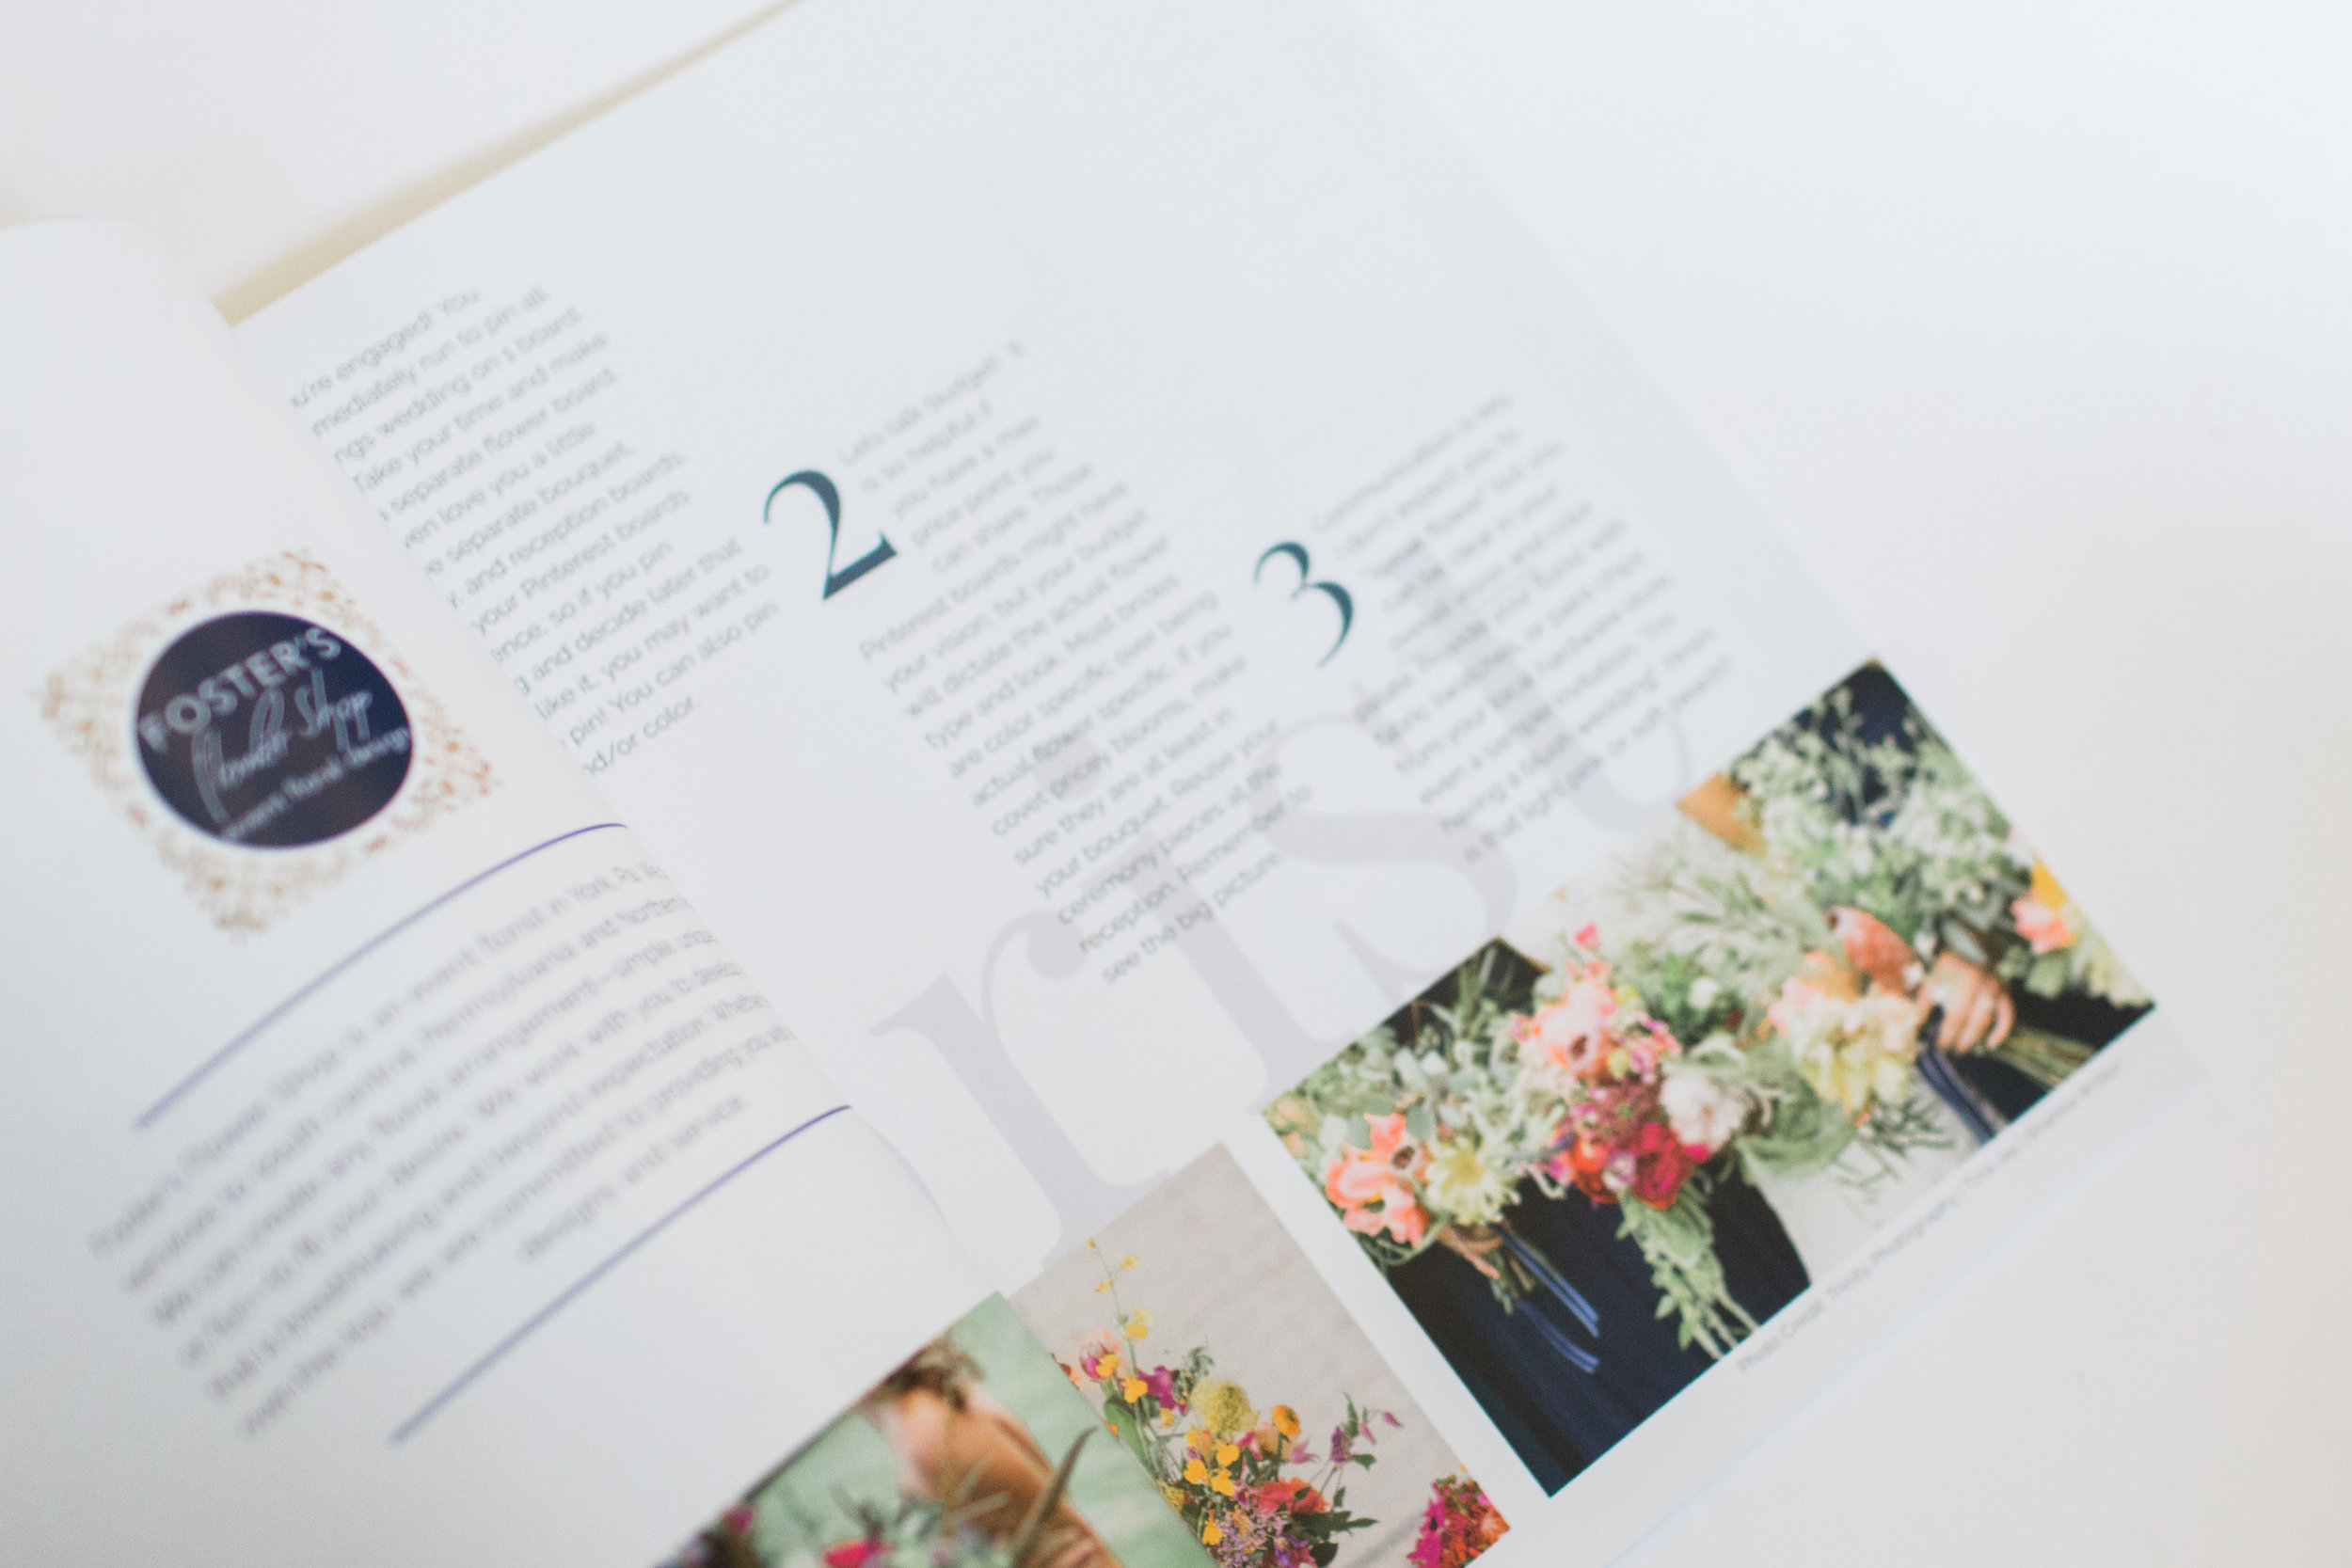 magazinepics-3.jpg